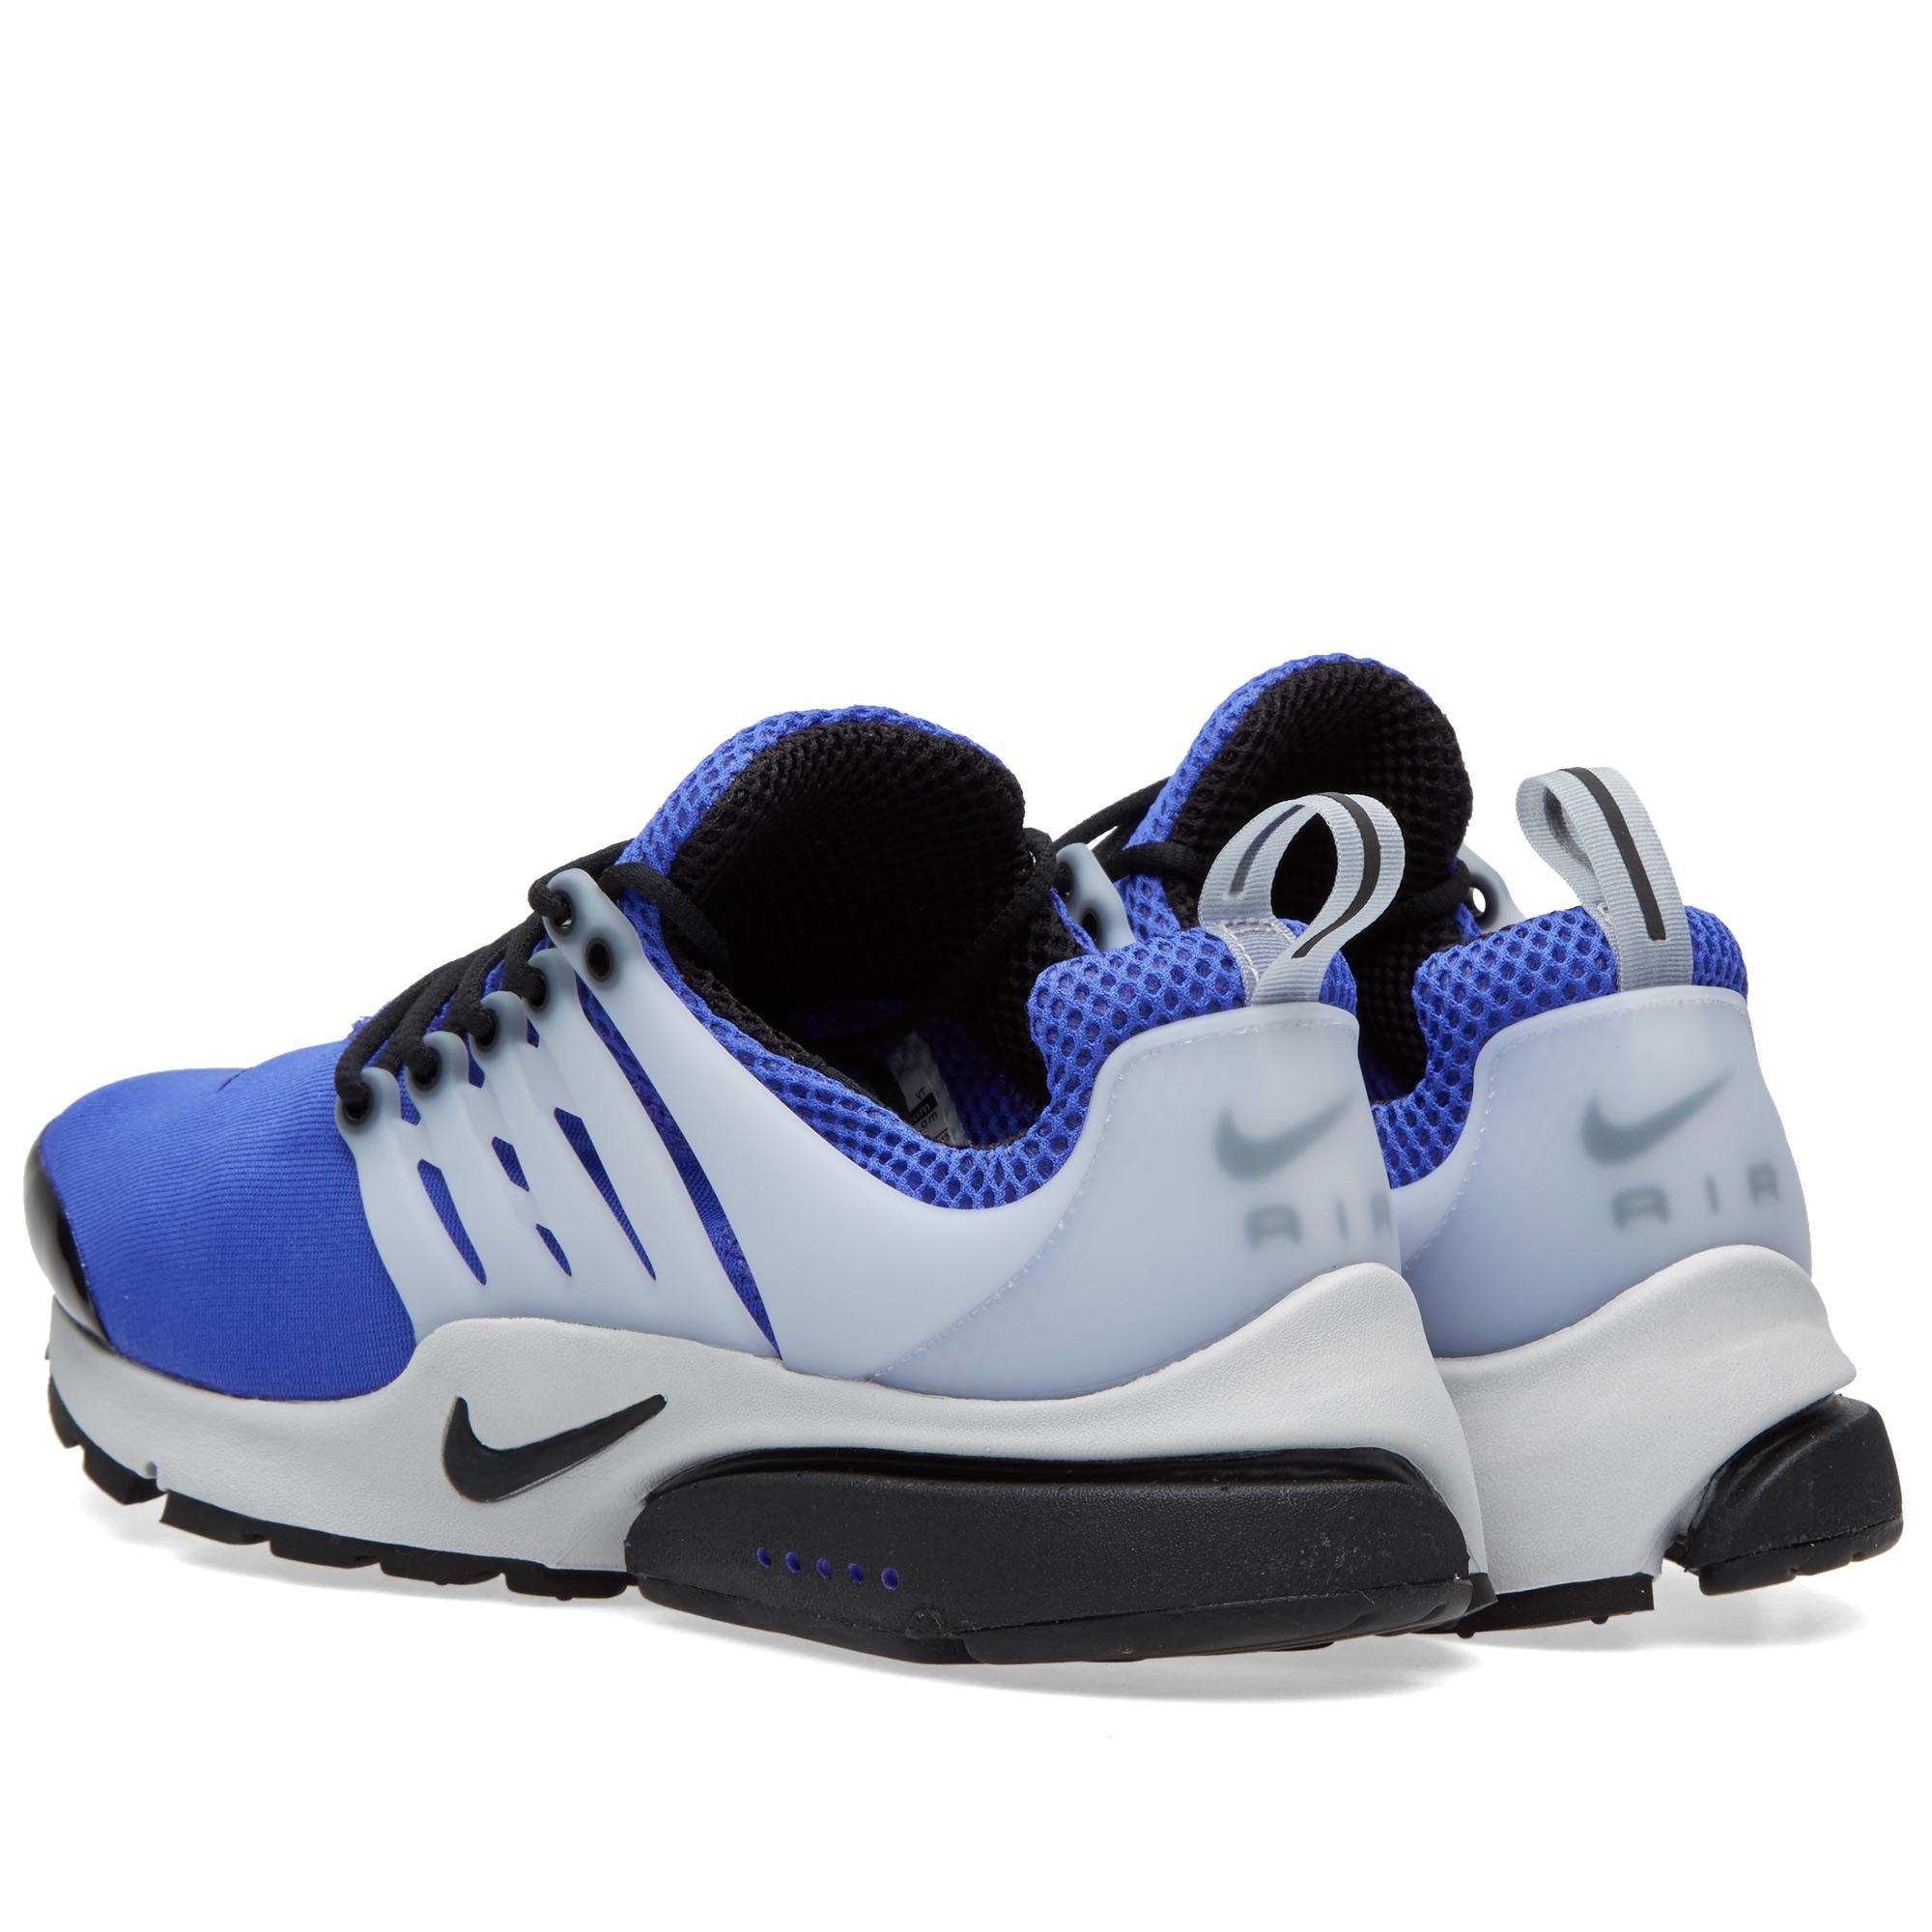 Nike Air Presto Violet